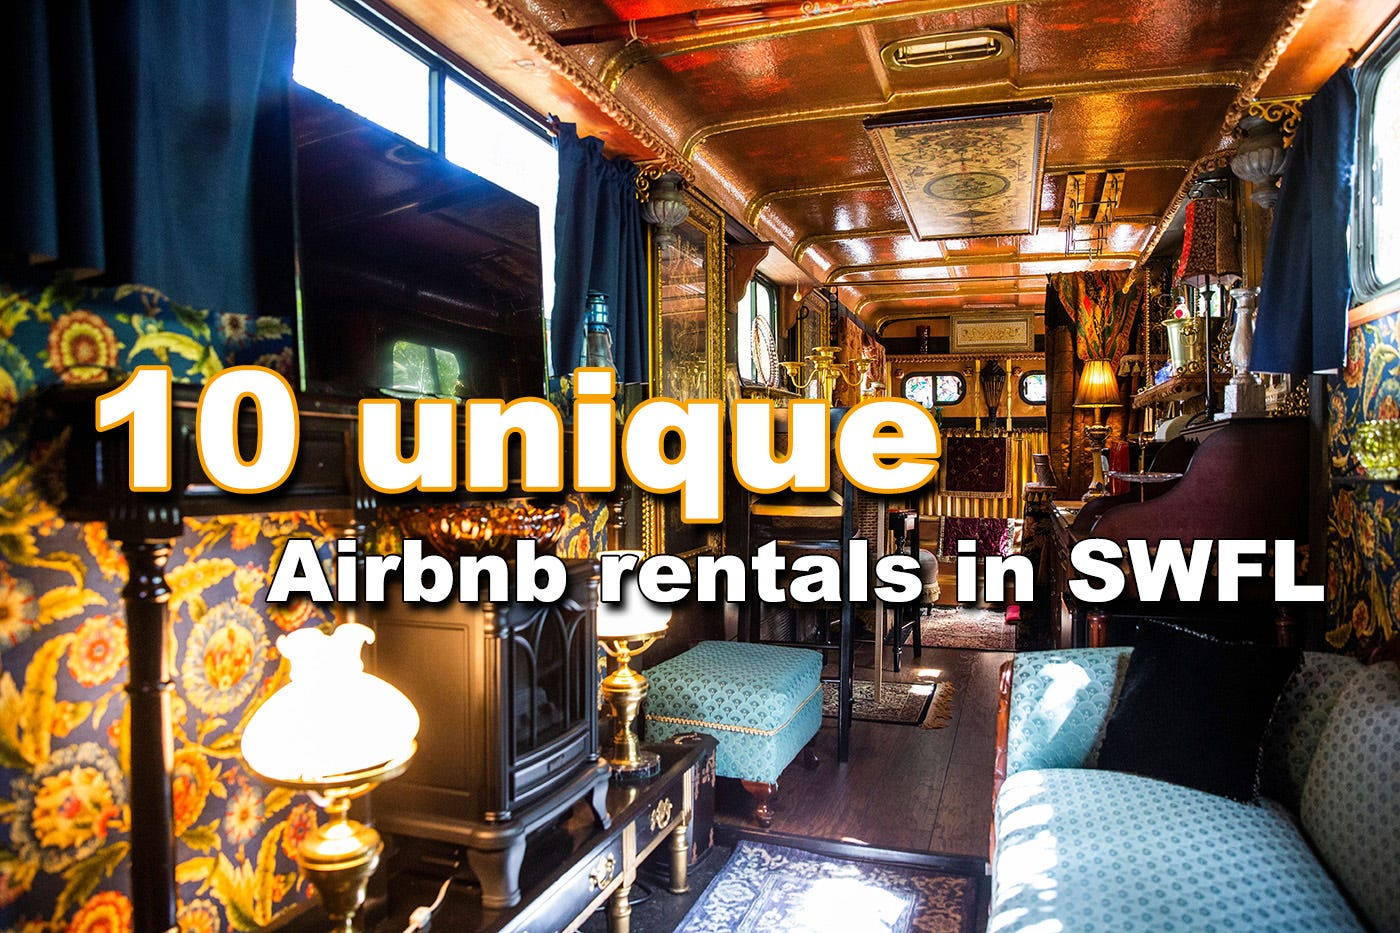 Video: 10 unique Airbnb rentals in Southwest Florida